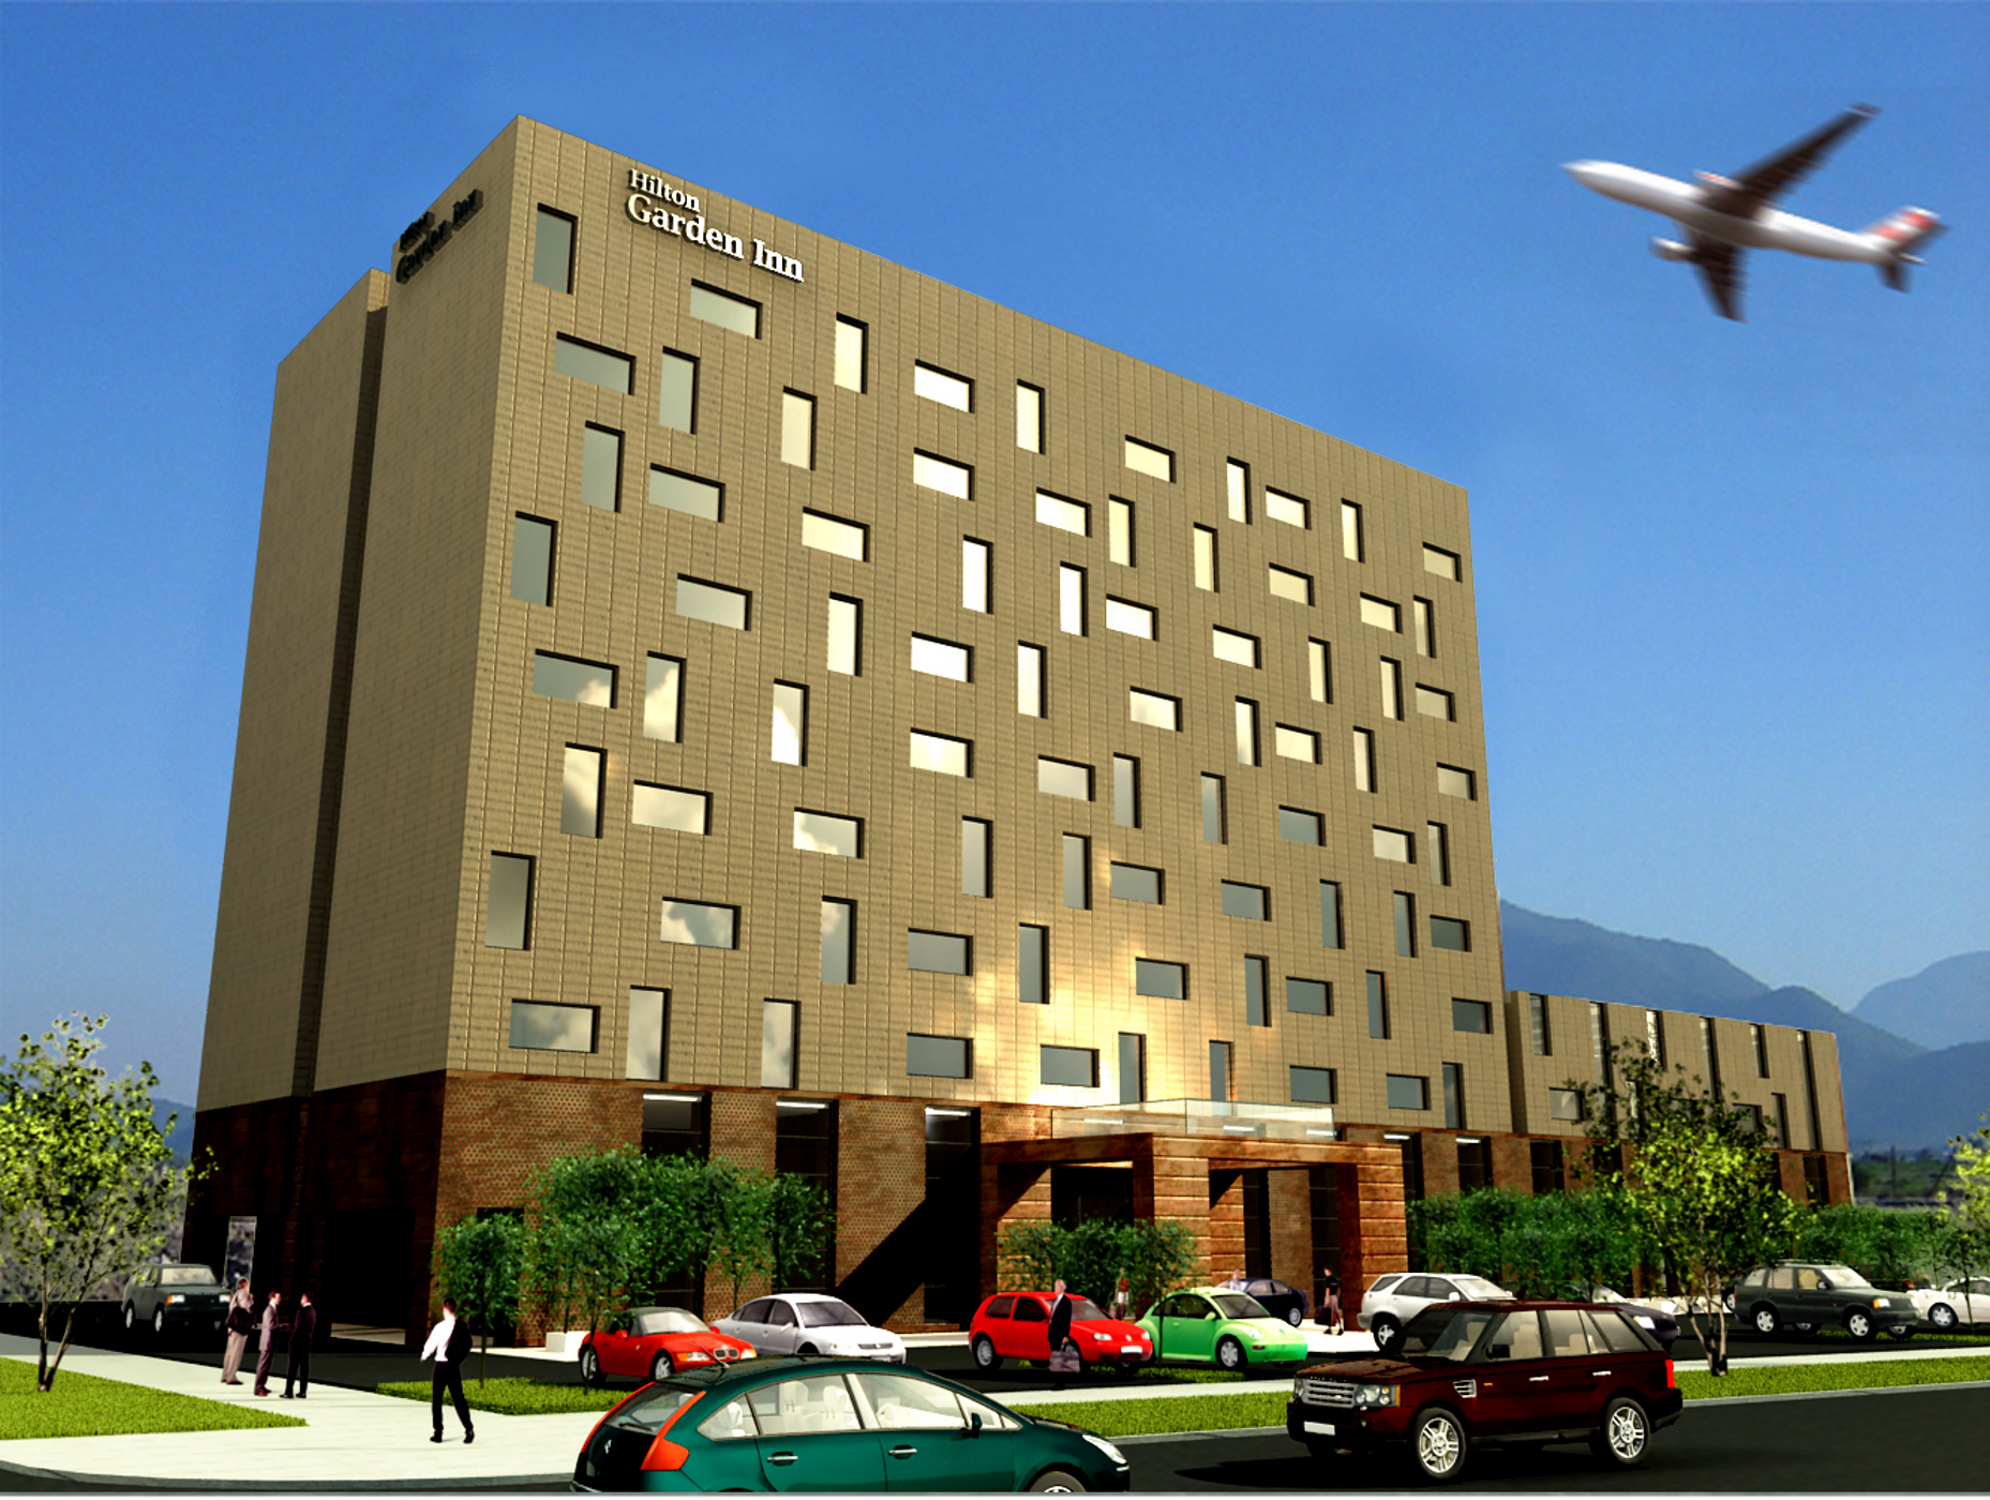 Hotel Hilton Garden Inn Santiago Airport In Santiago Pictures And Videos Gallery